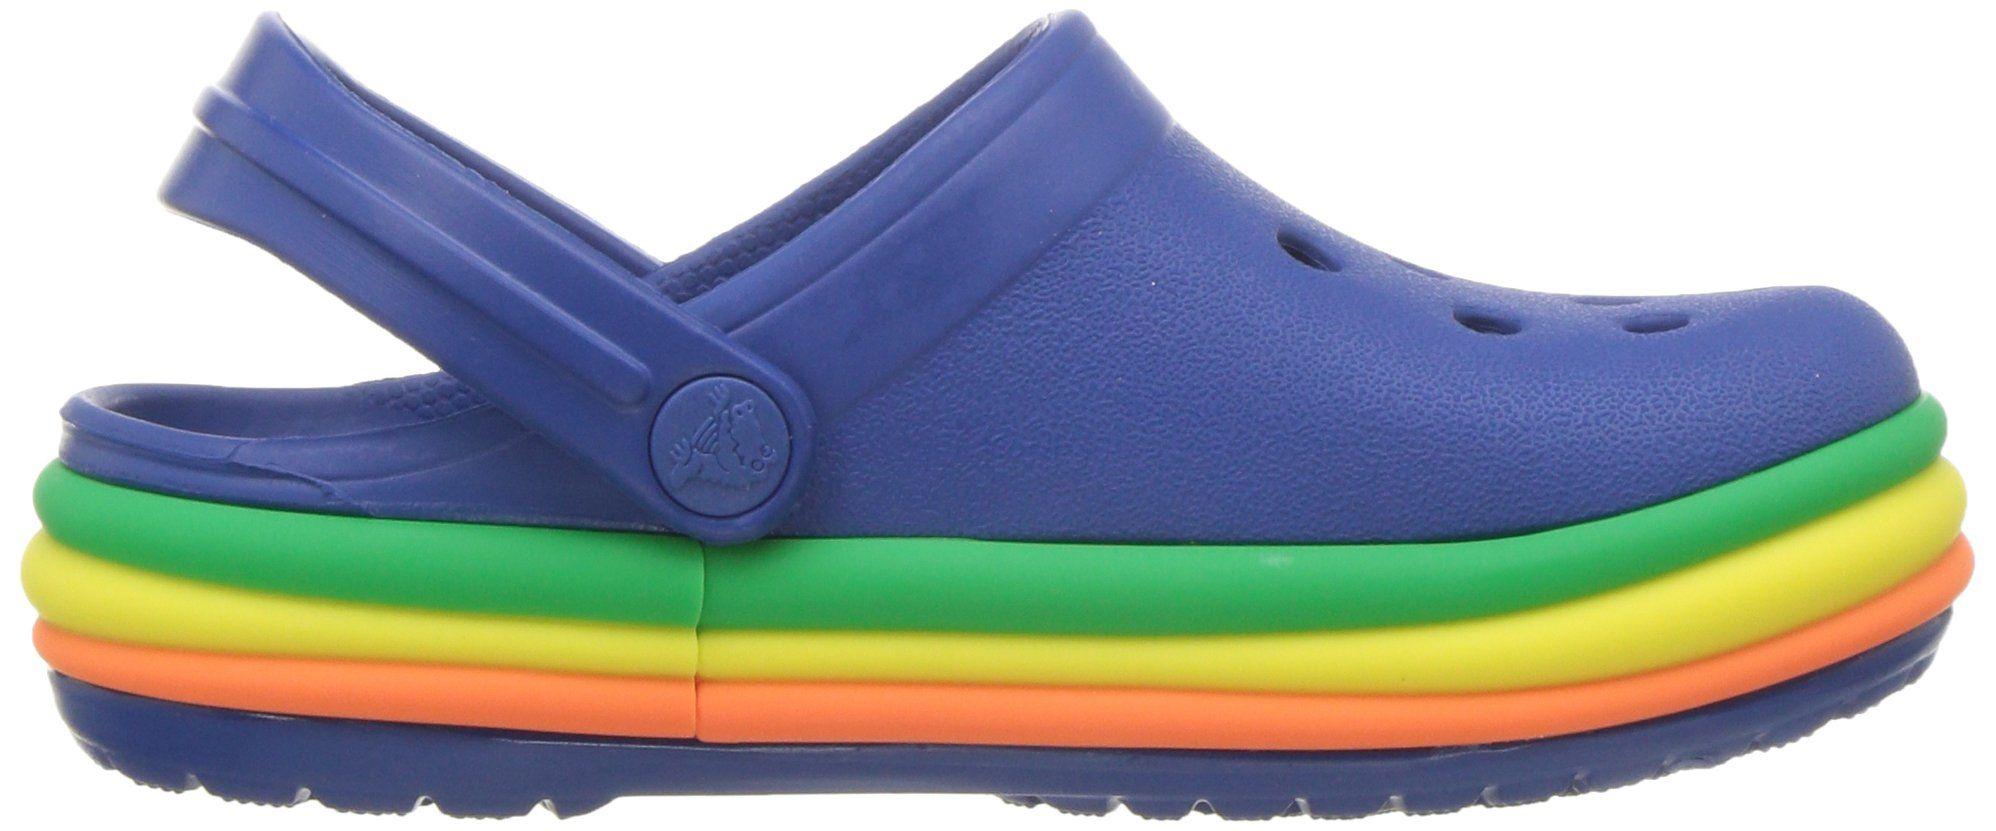 4110b15f5 Crocs Crocband Fun Lab Graphic Rainbow Band Lightup Clog Blue Jean Ocean 9  M US